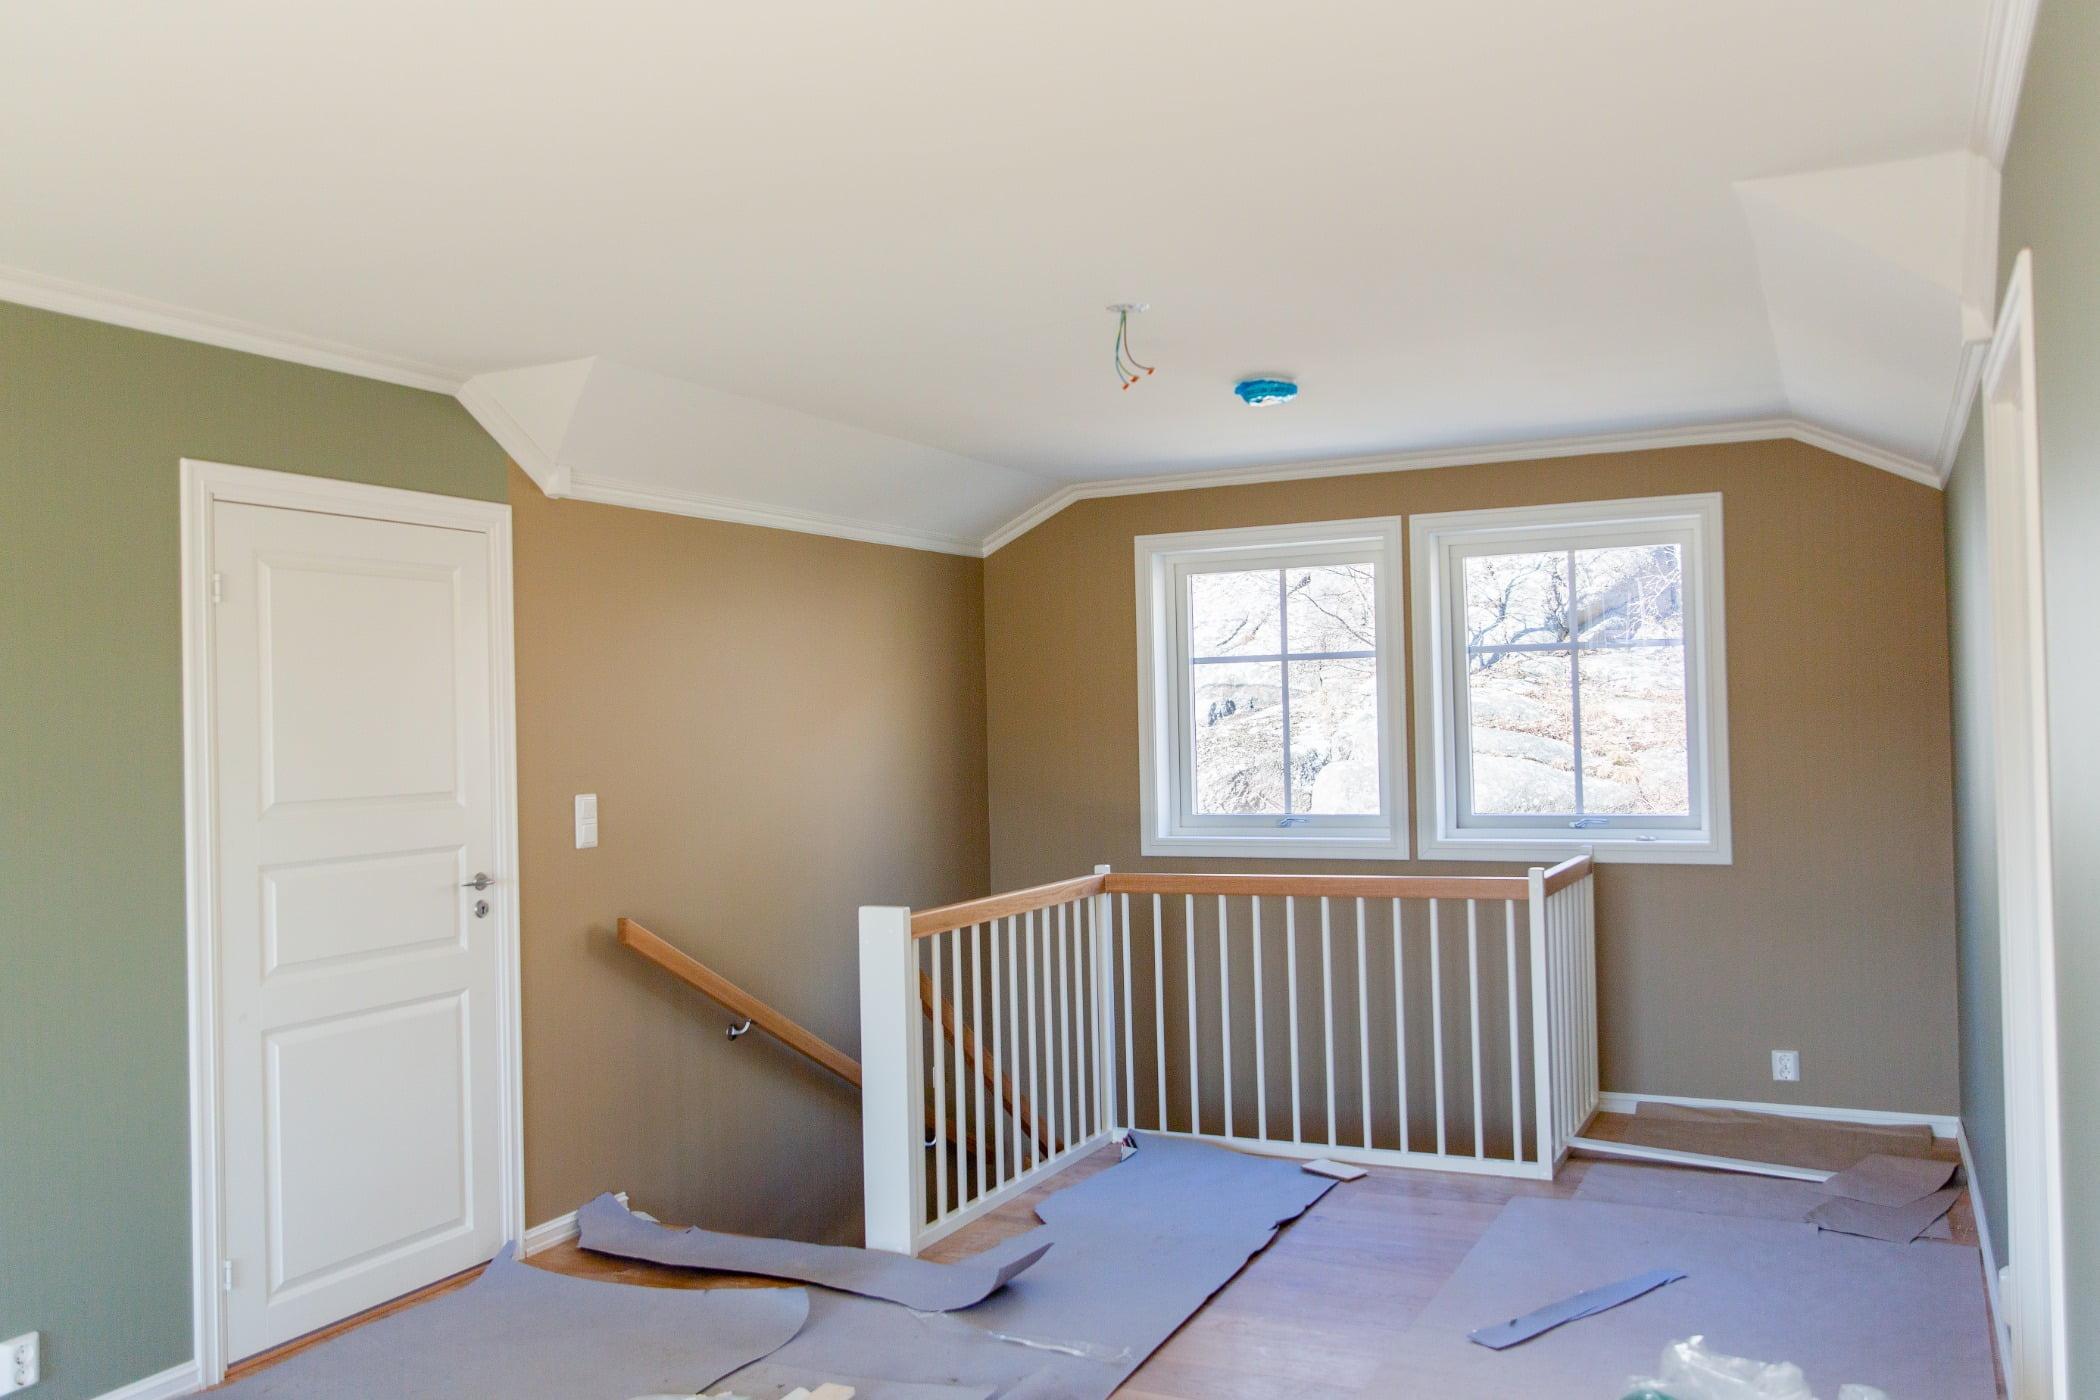 Interior design, Wood stain, Property, Window, Fixture, Paint, Flooring, Floor, Shade